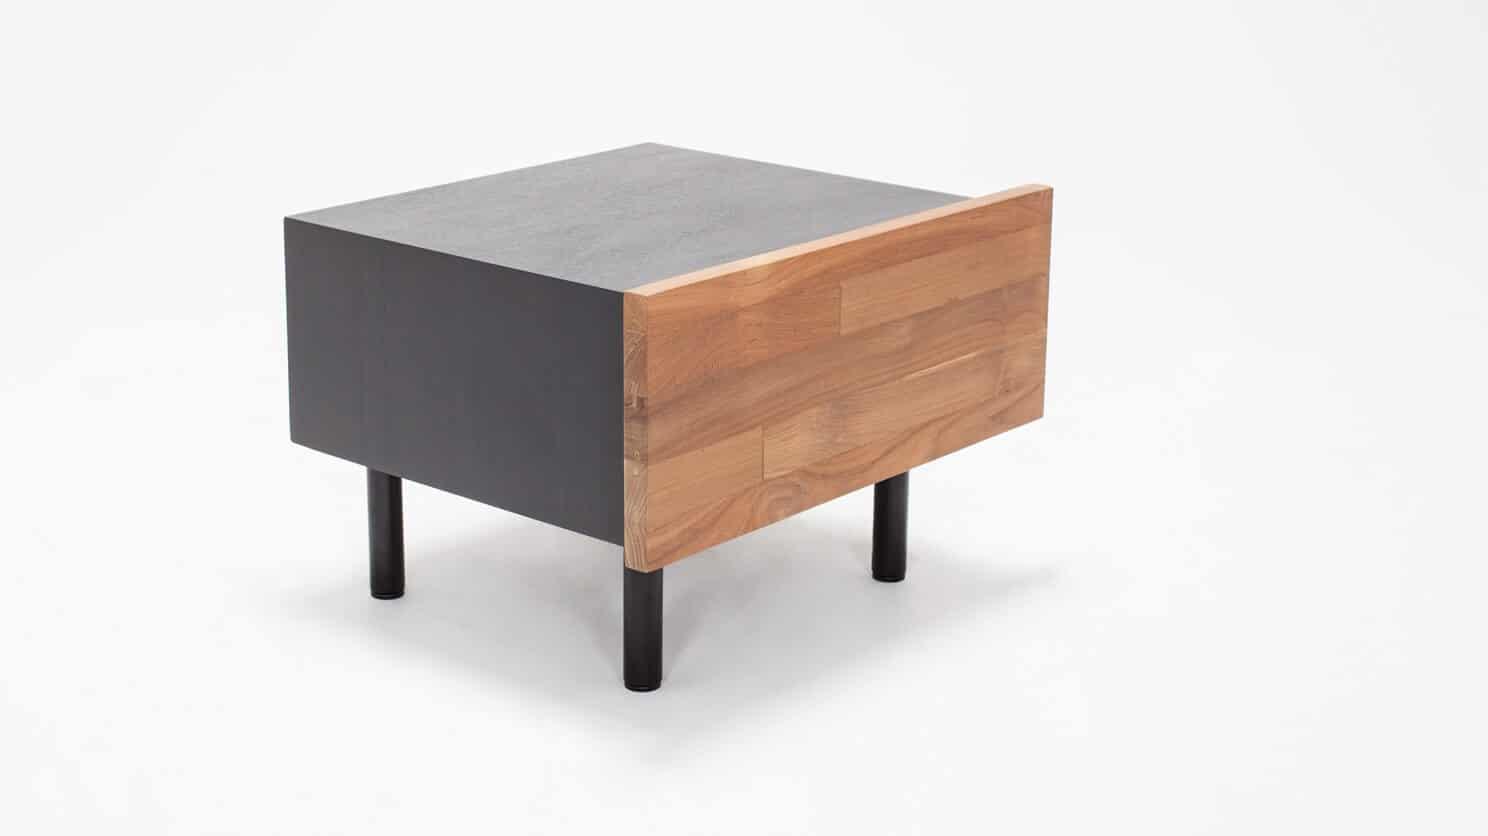 7040 431 par 4 nightstands reclaimed teak nightstand charcoal detail 01